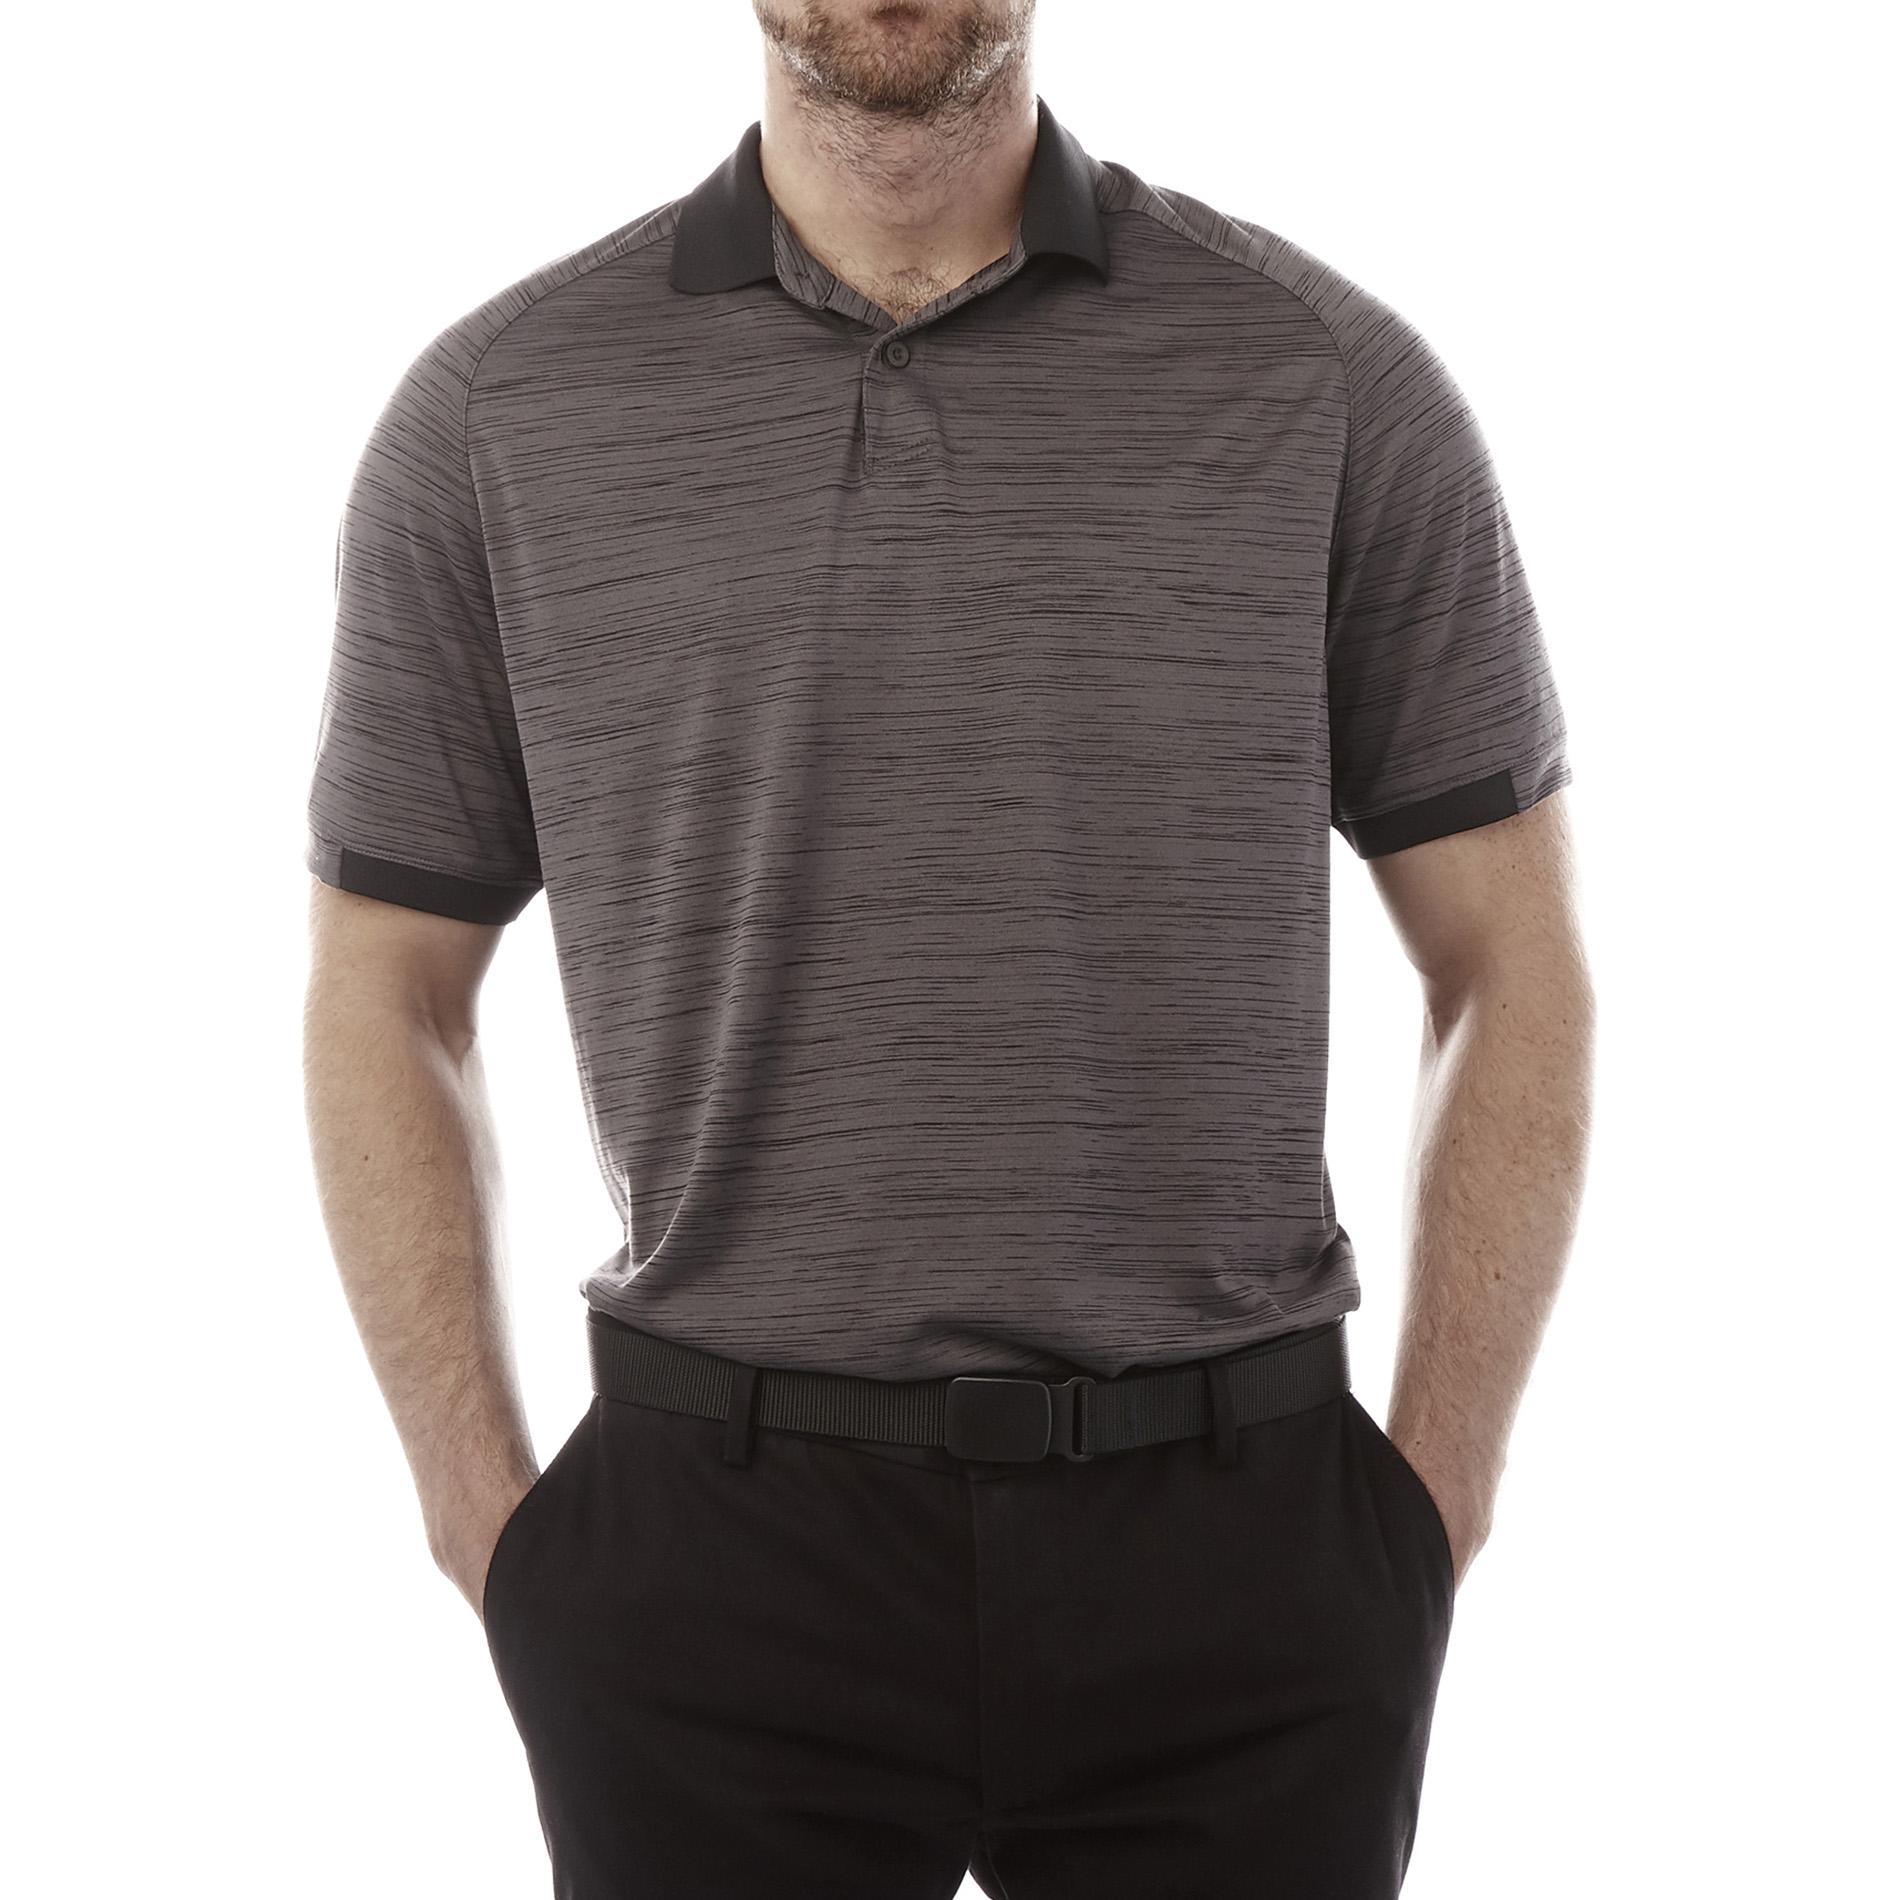 Elevate TM16510 - Men's EMORY Short Sleeve Polo